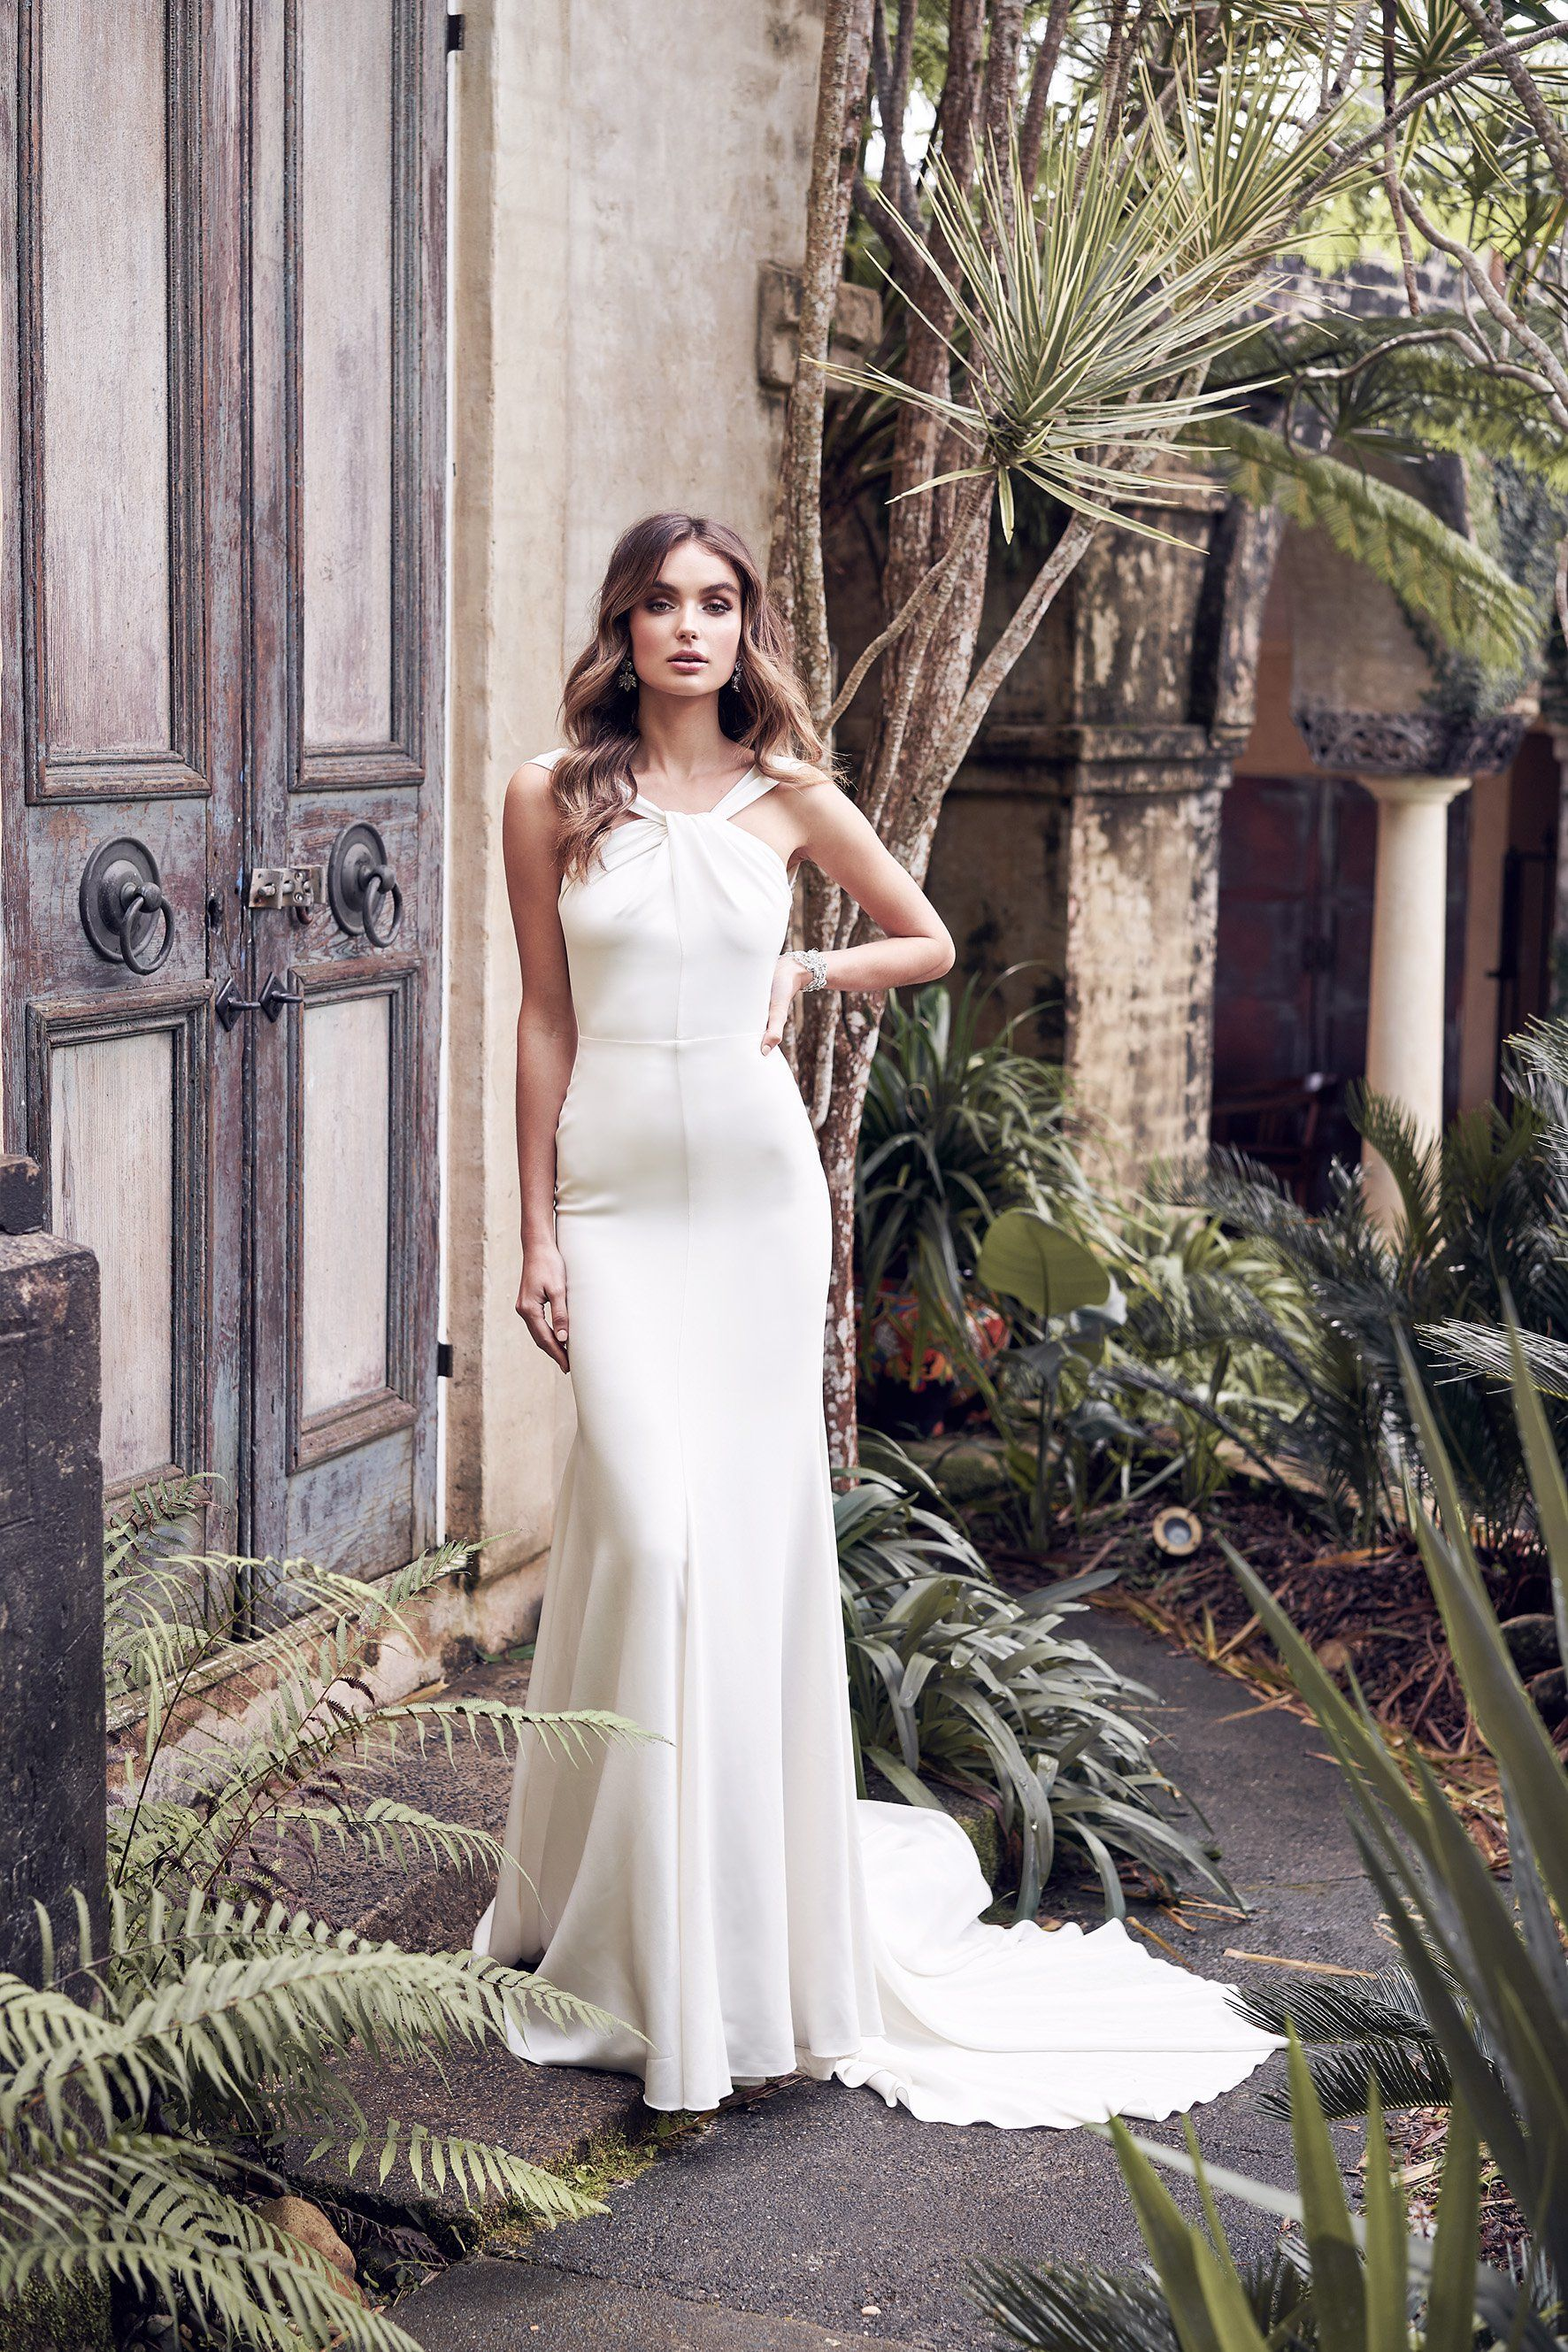 Anna Campbell Wander Wedding Realwedding Realbride Bride Dress Styles Quiz